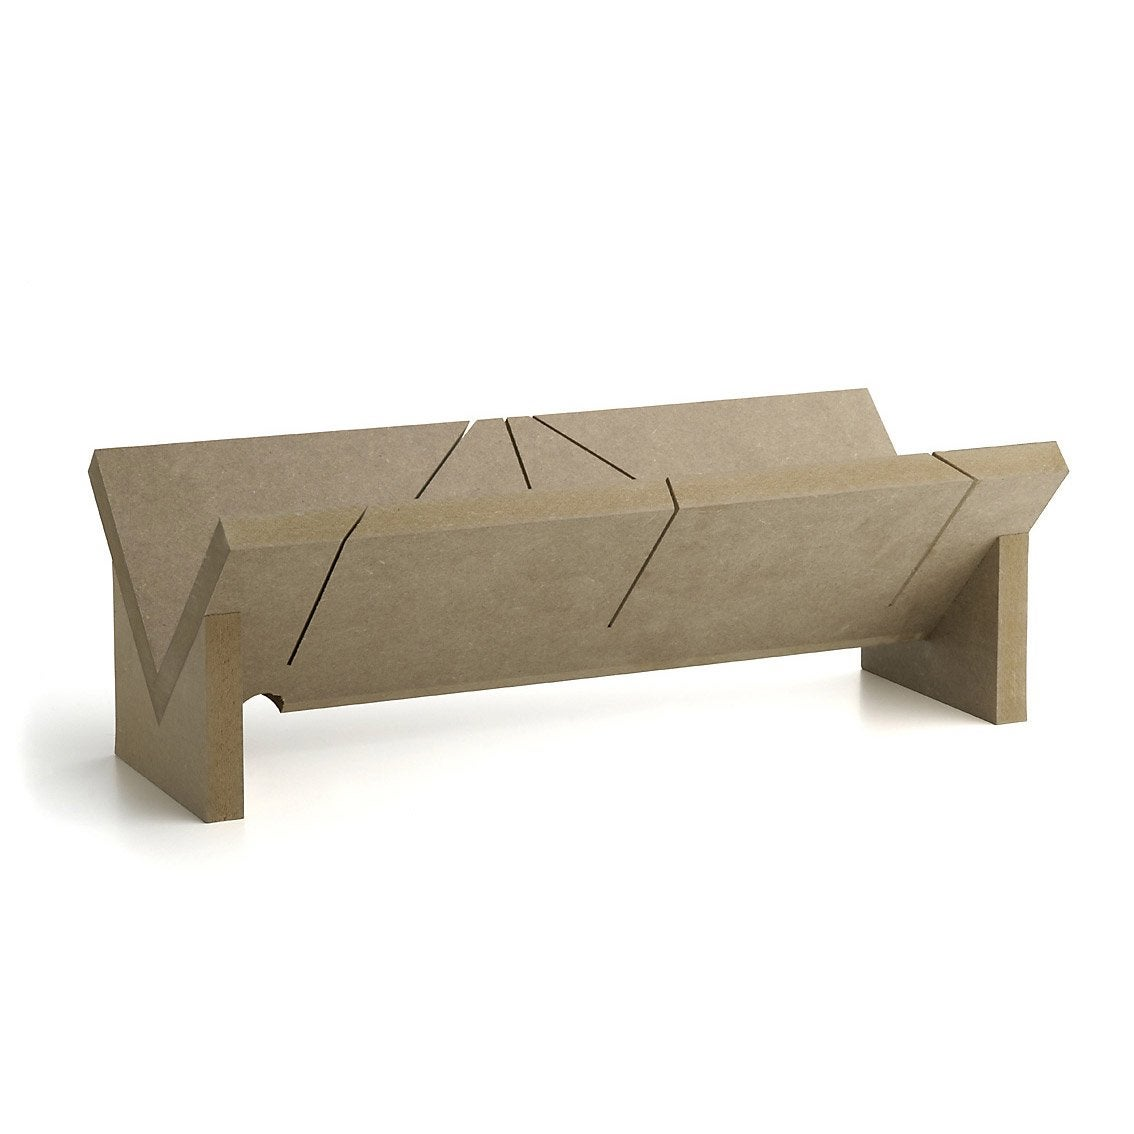 bo te d coupe 44 5 x 21 5 cm leroy merlin. Black Bedroom Furniture Sets. Home Design Ideas